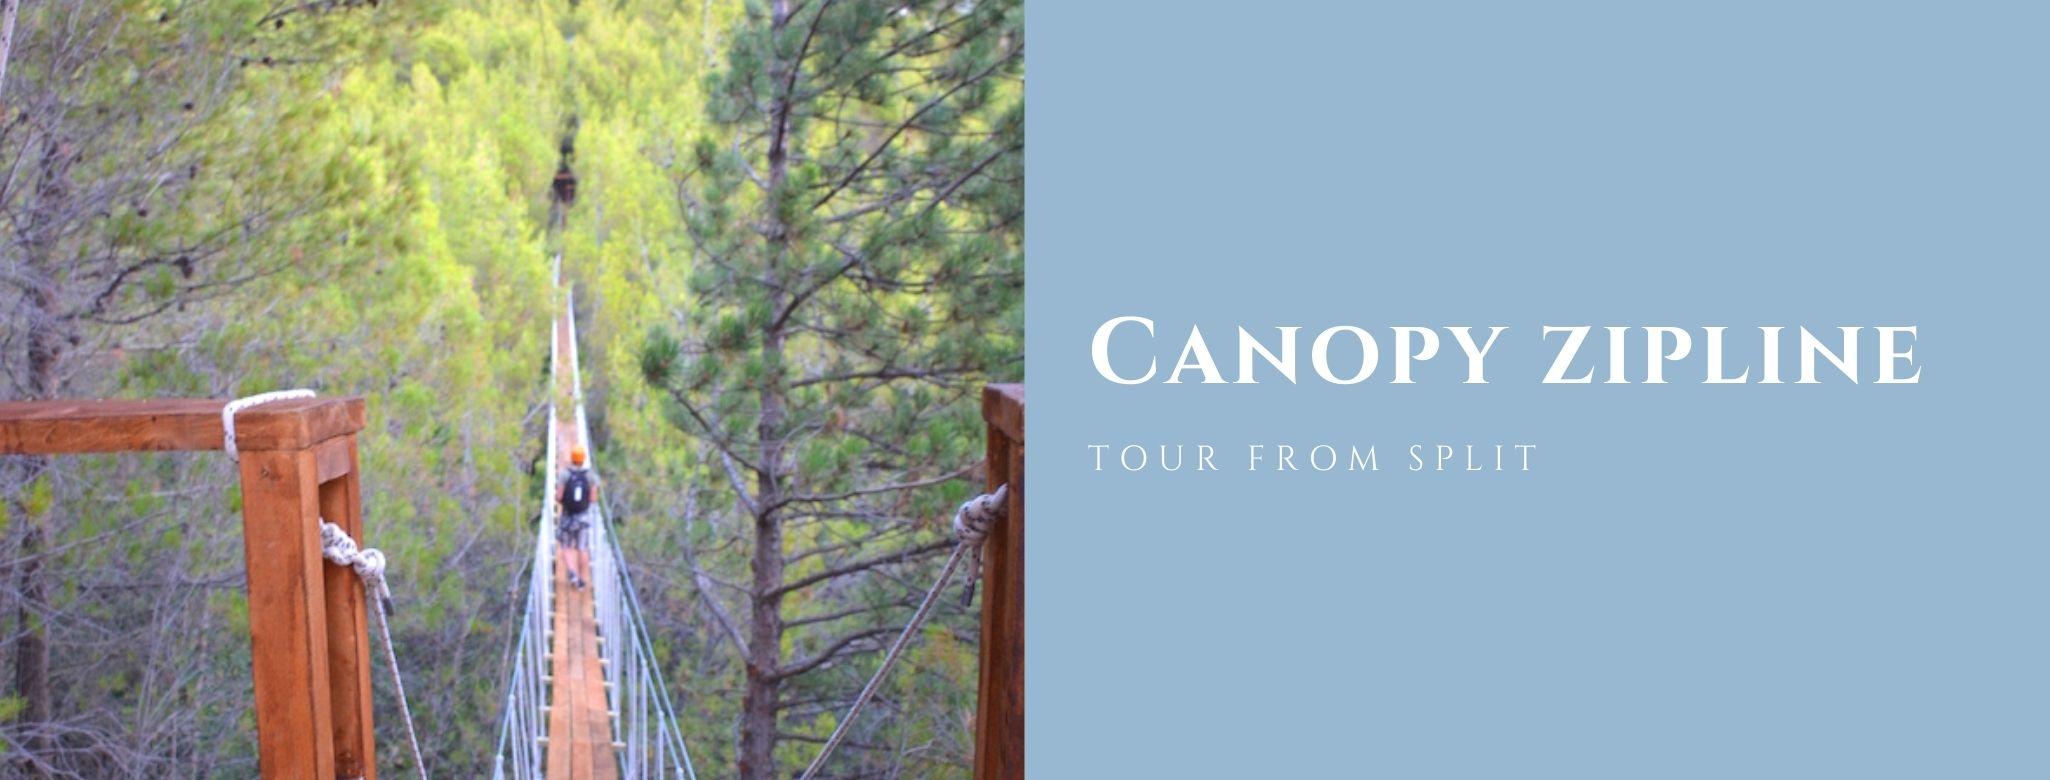 Canopy Zipline tour from Split